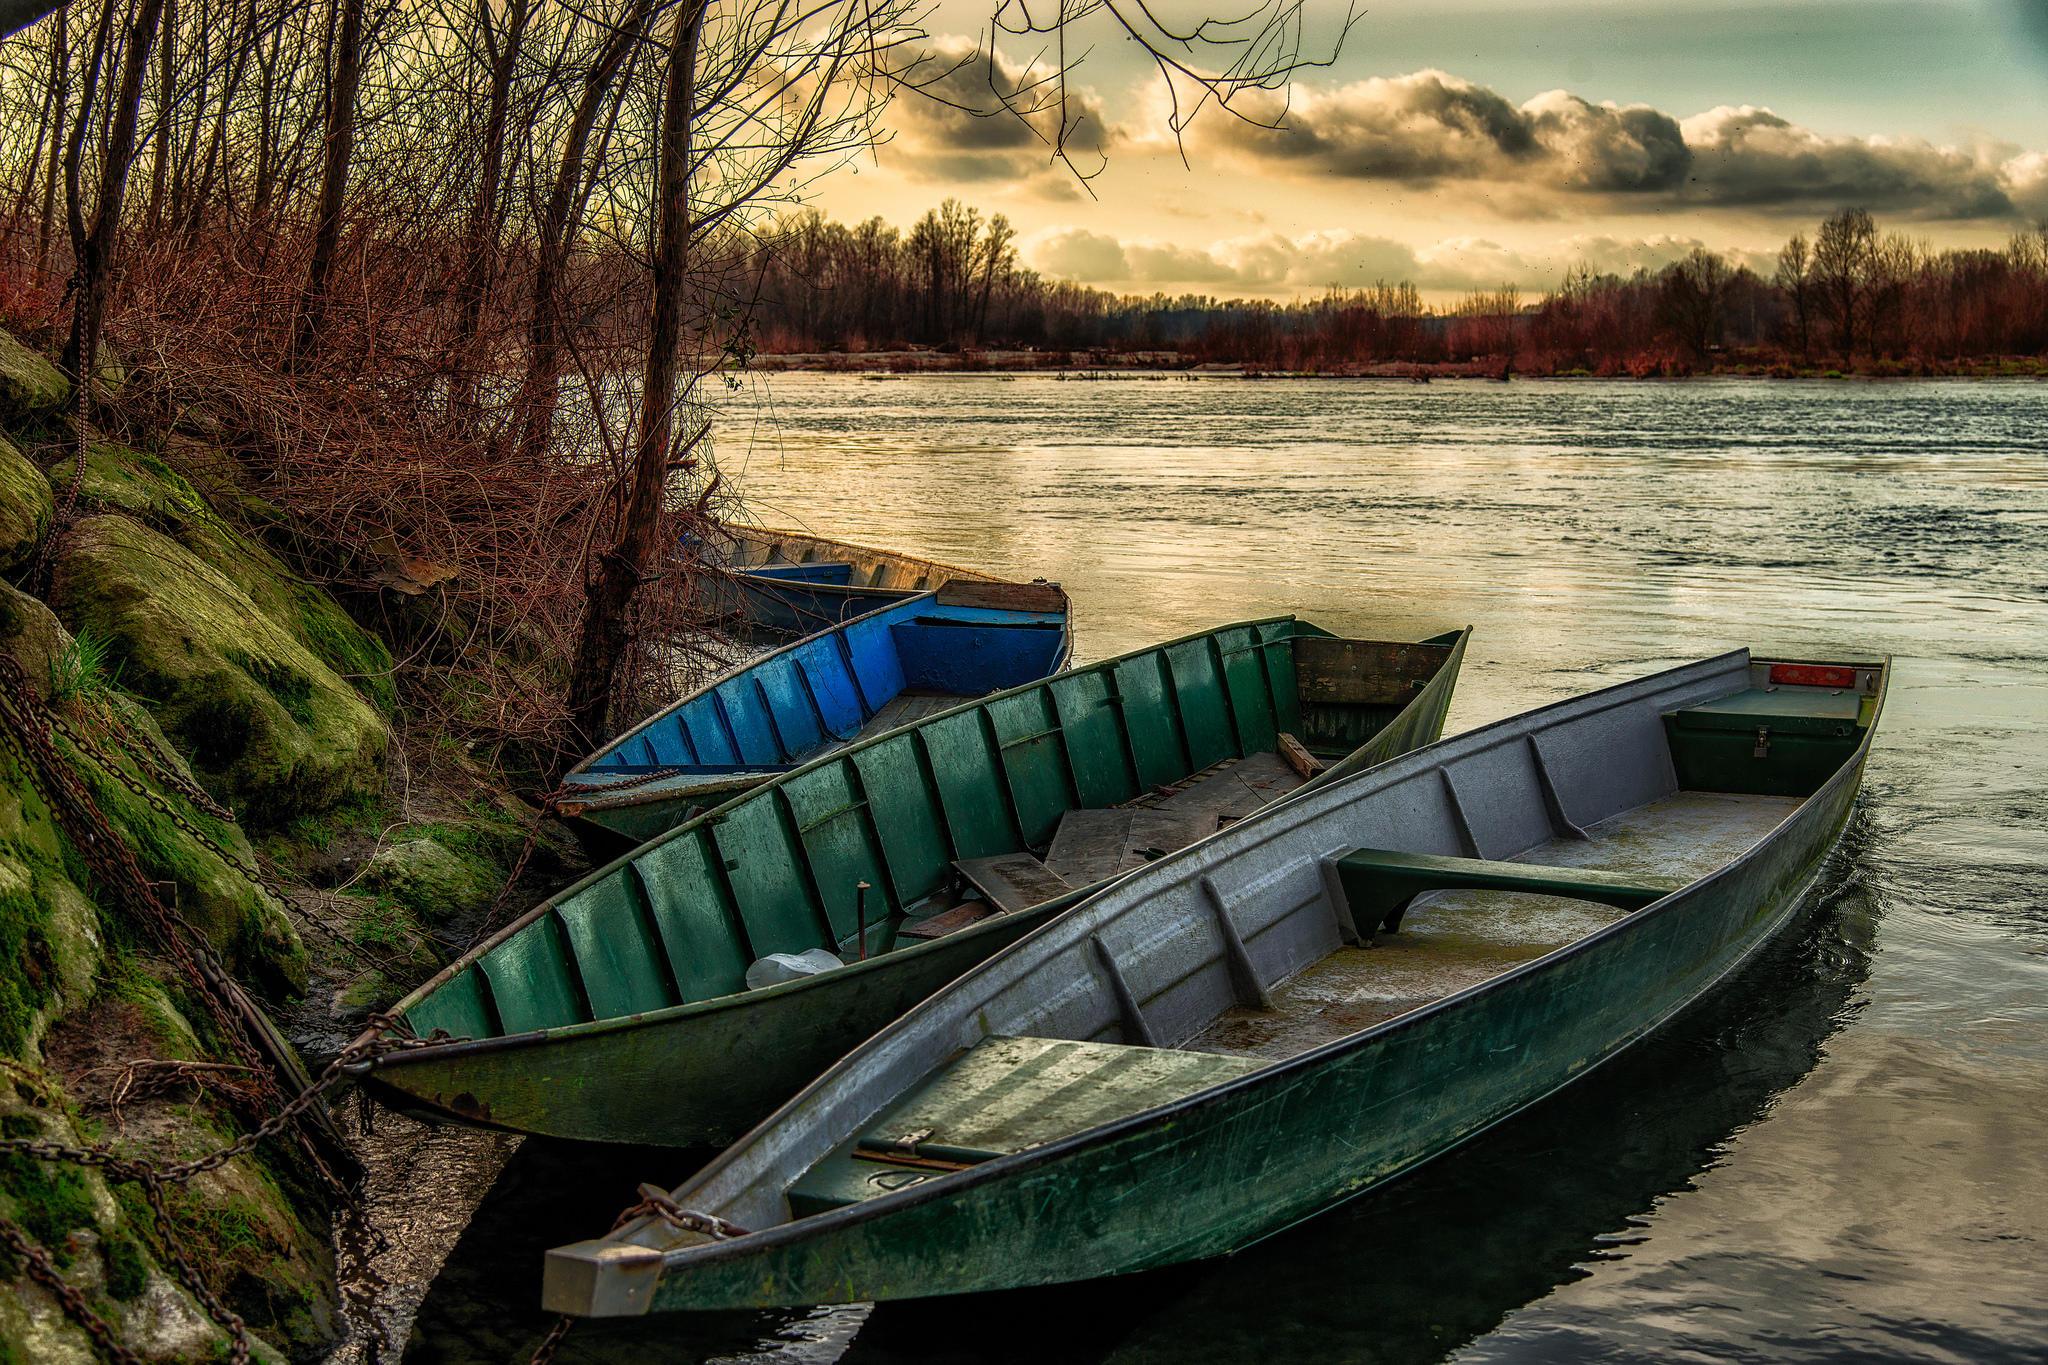 озеро фото картинок лодок столь